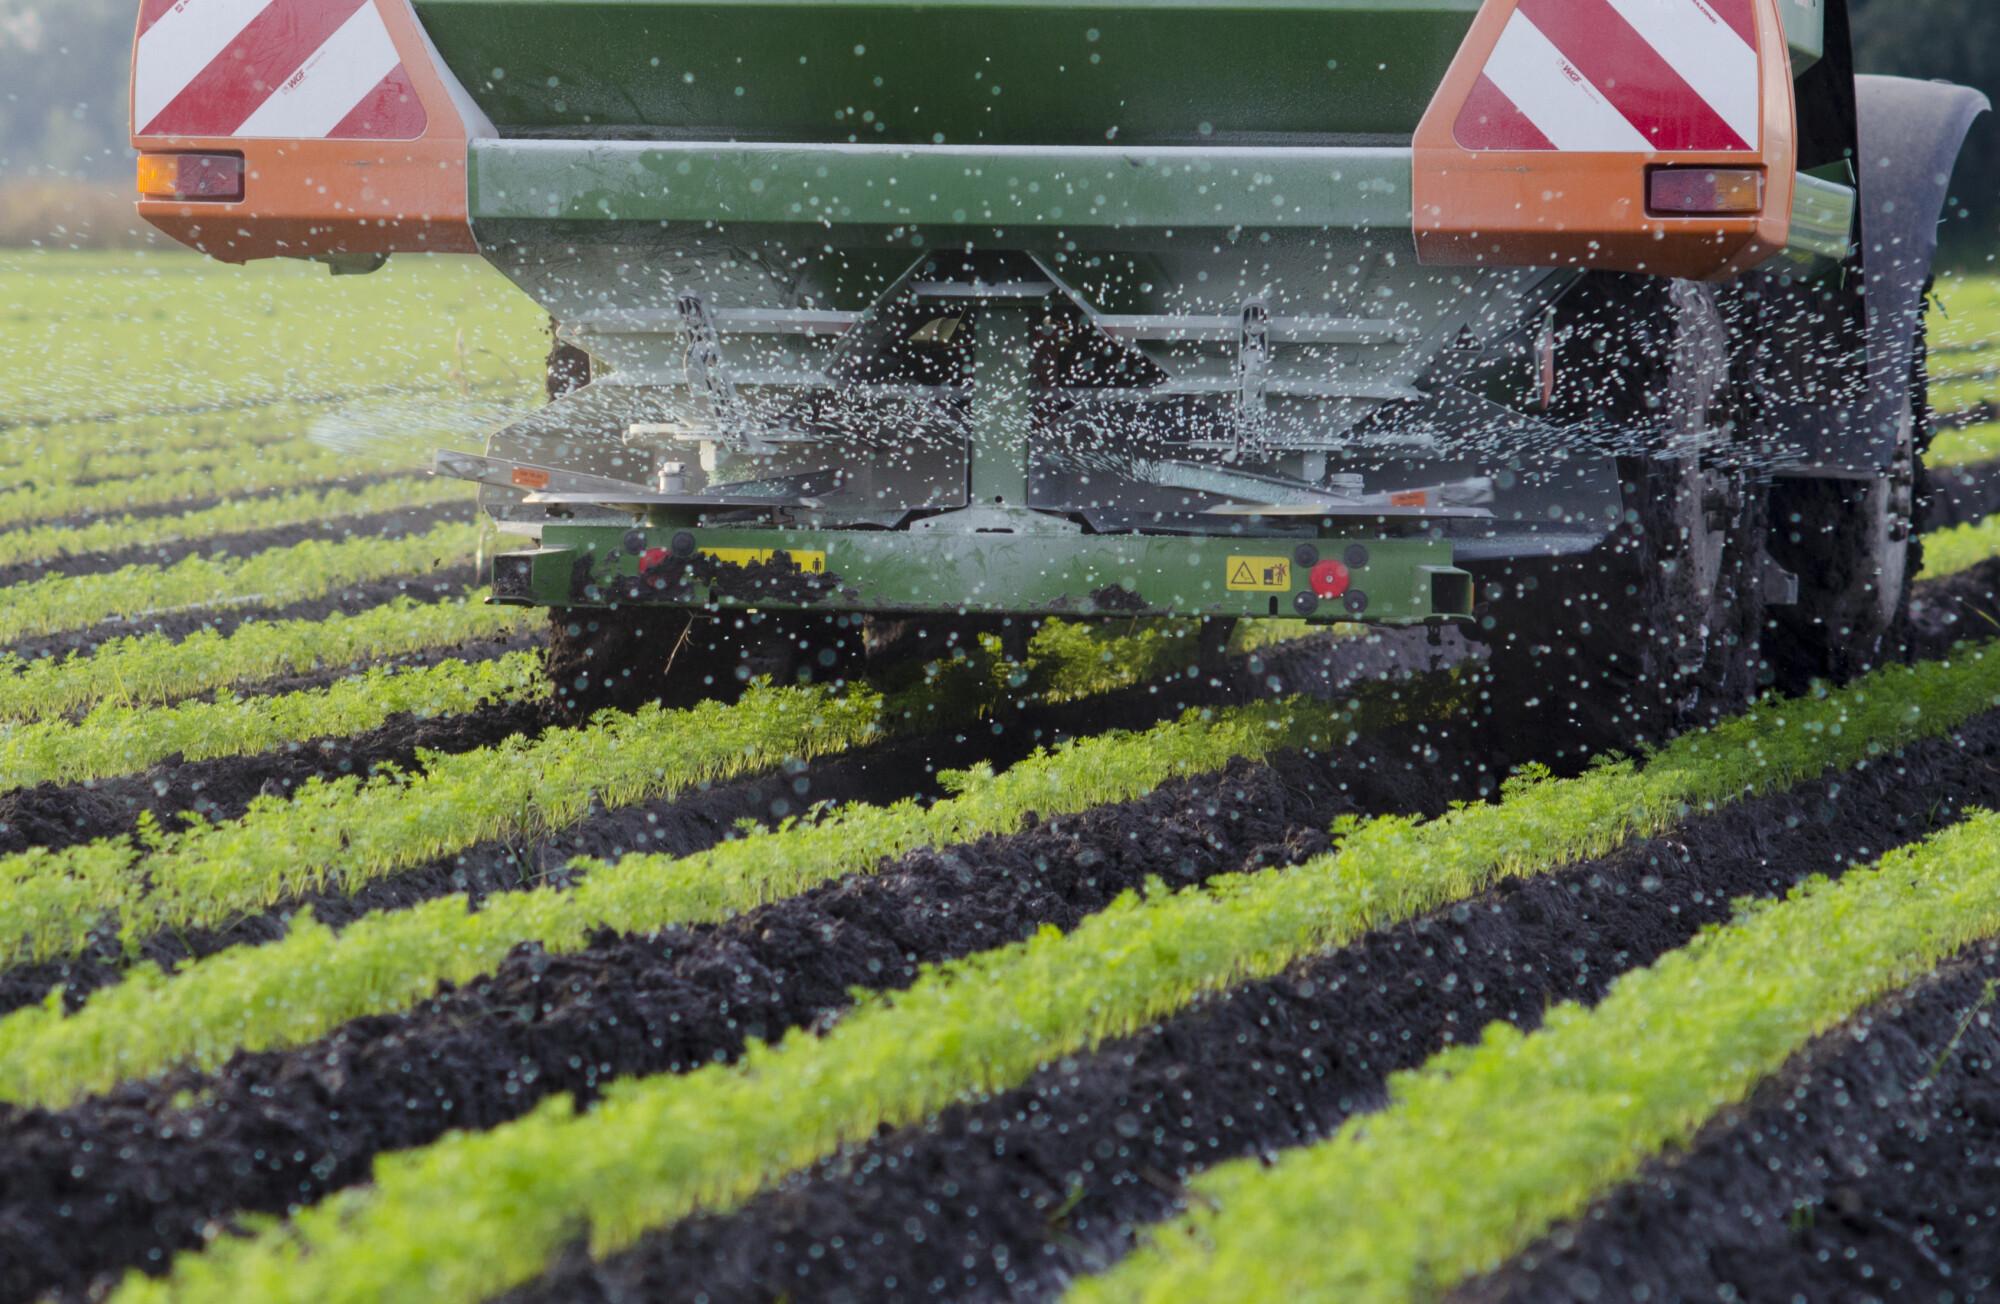 Agriculture - A farmer spraying fertiliser on his carrots